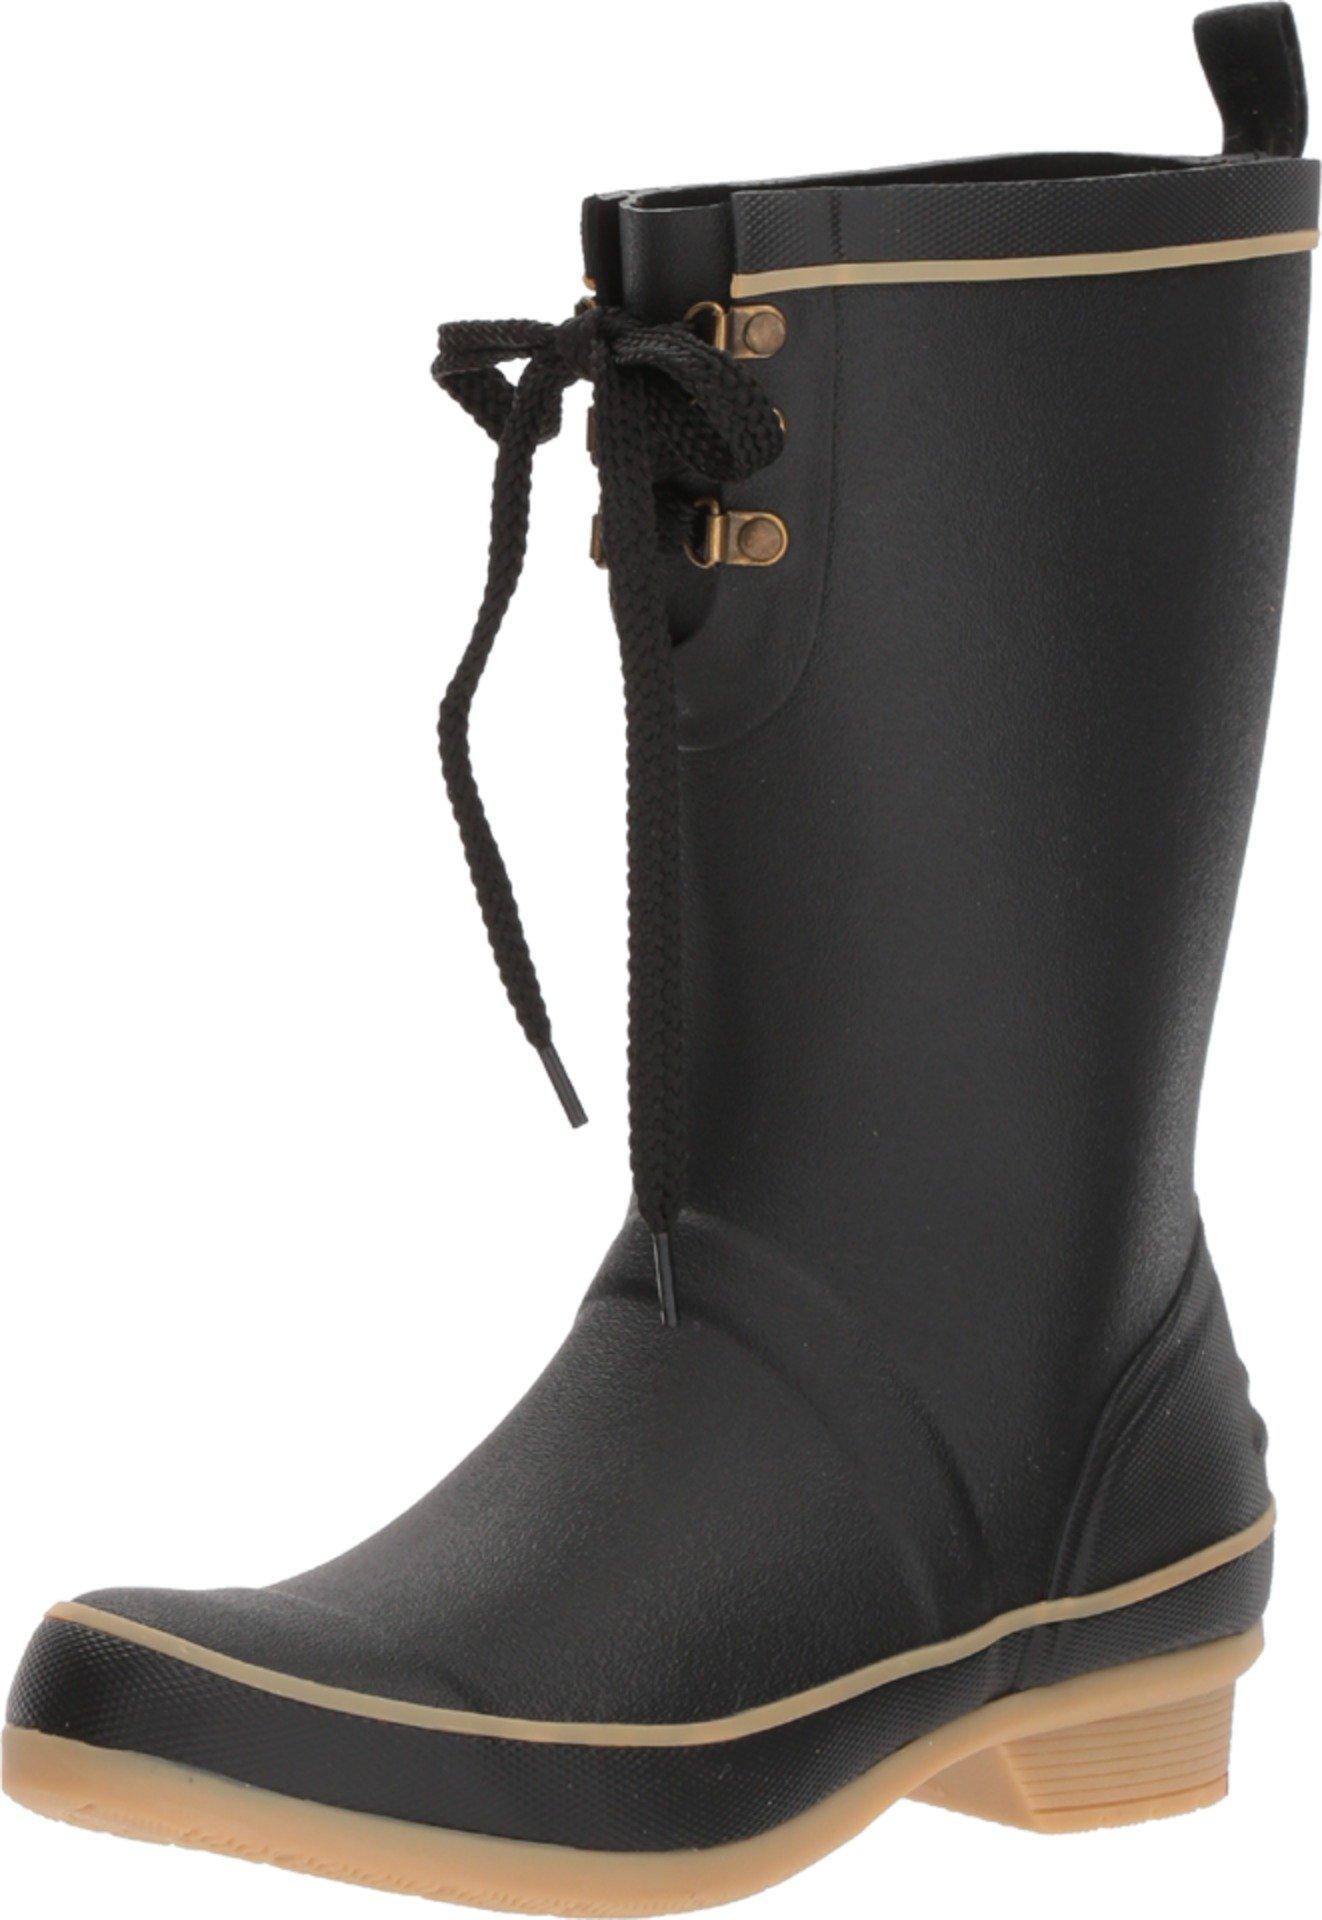 Chooka Women's Whidbey Rain Boots Black 9 M US